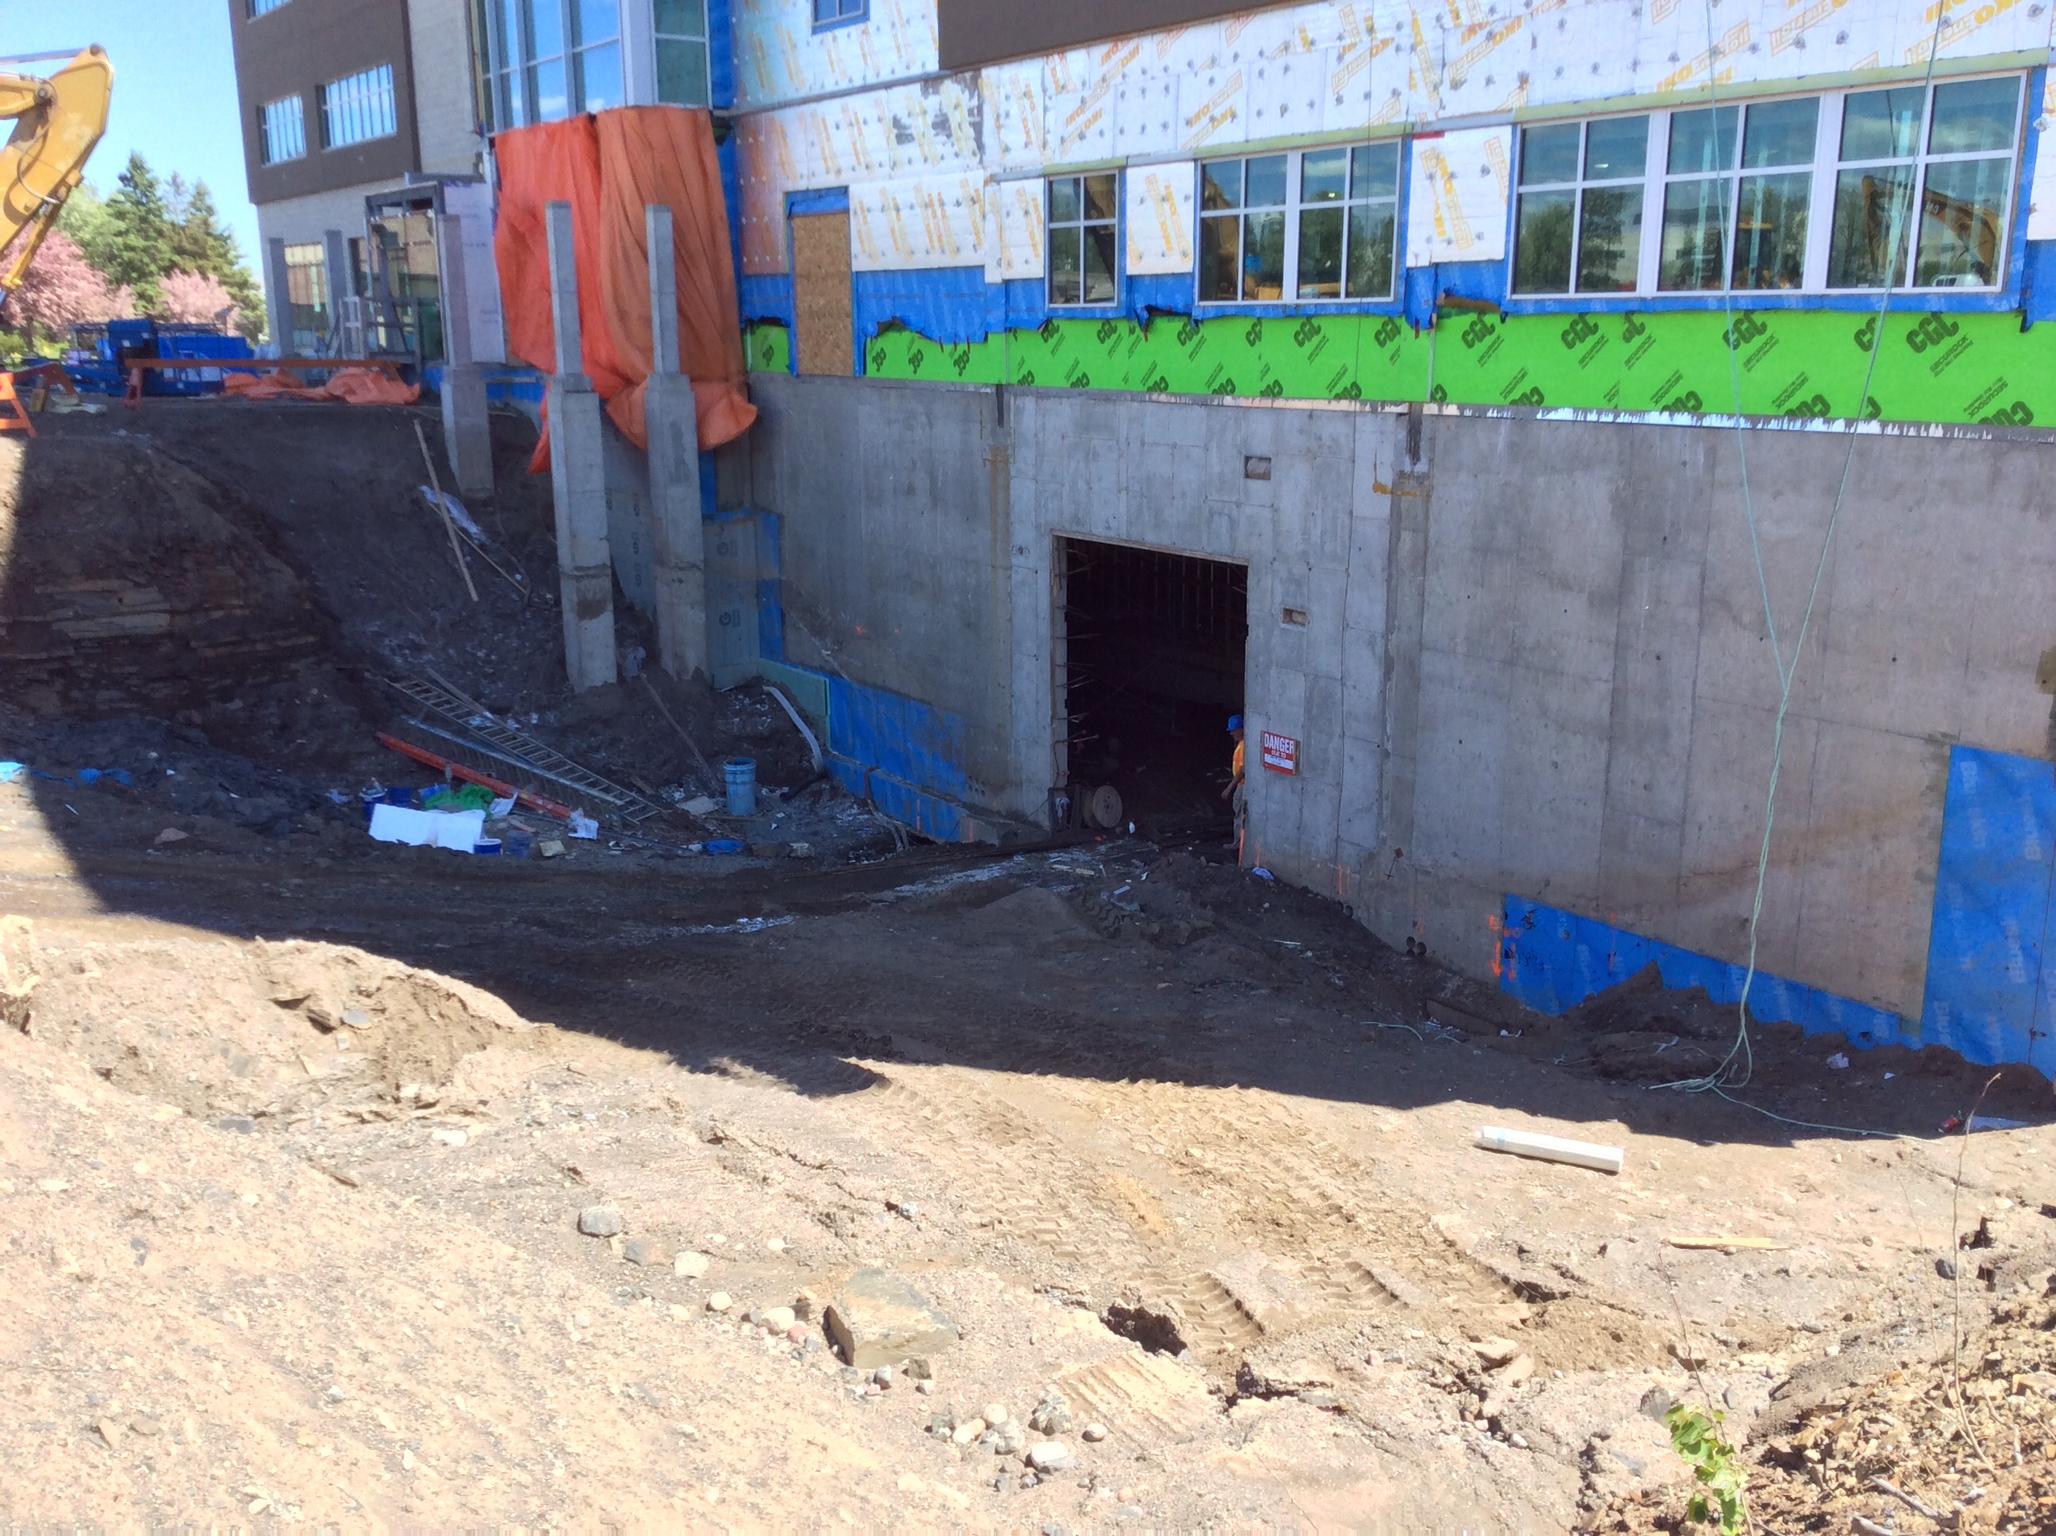 Bunker hole